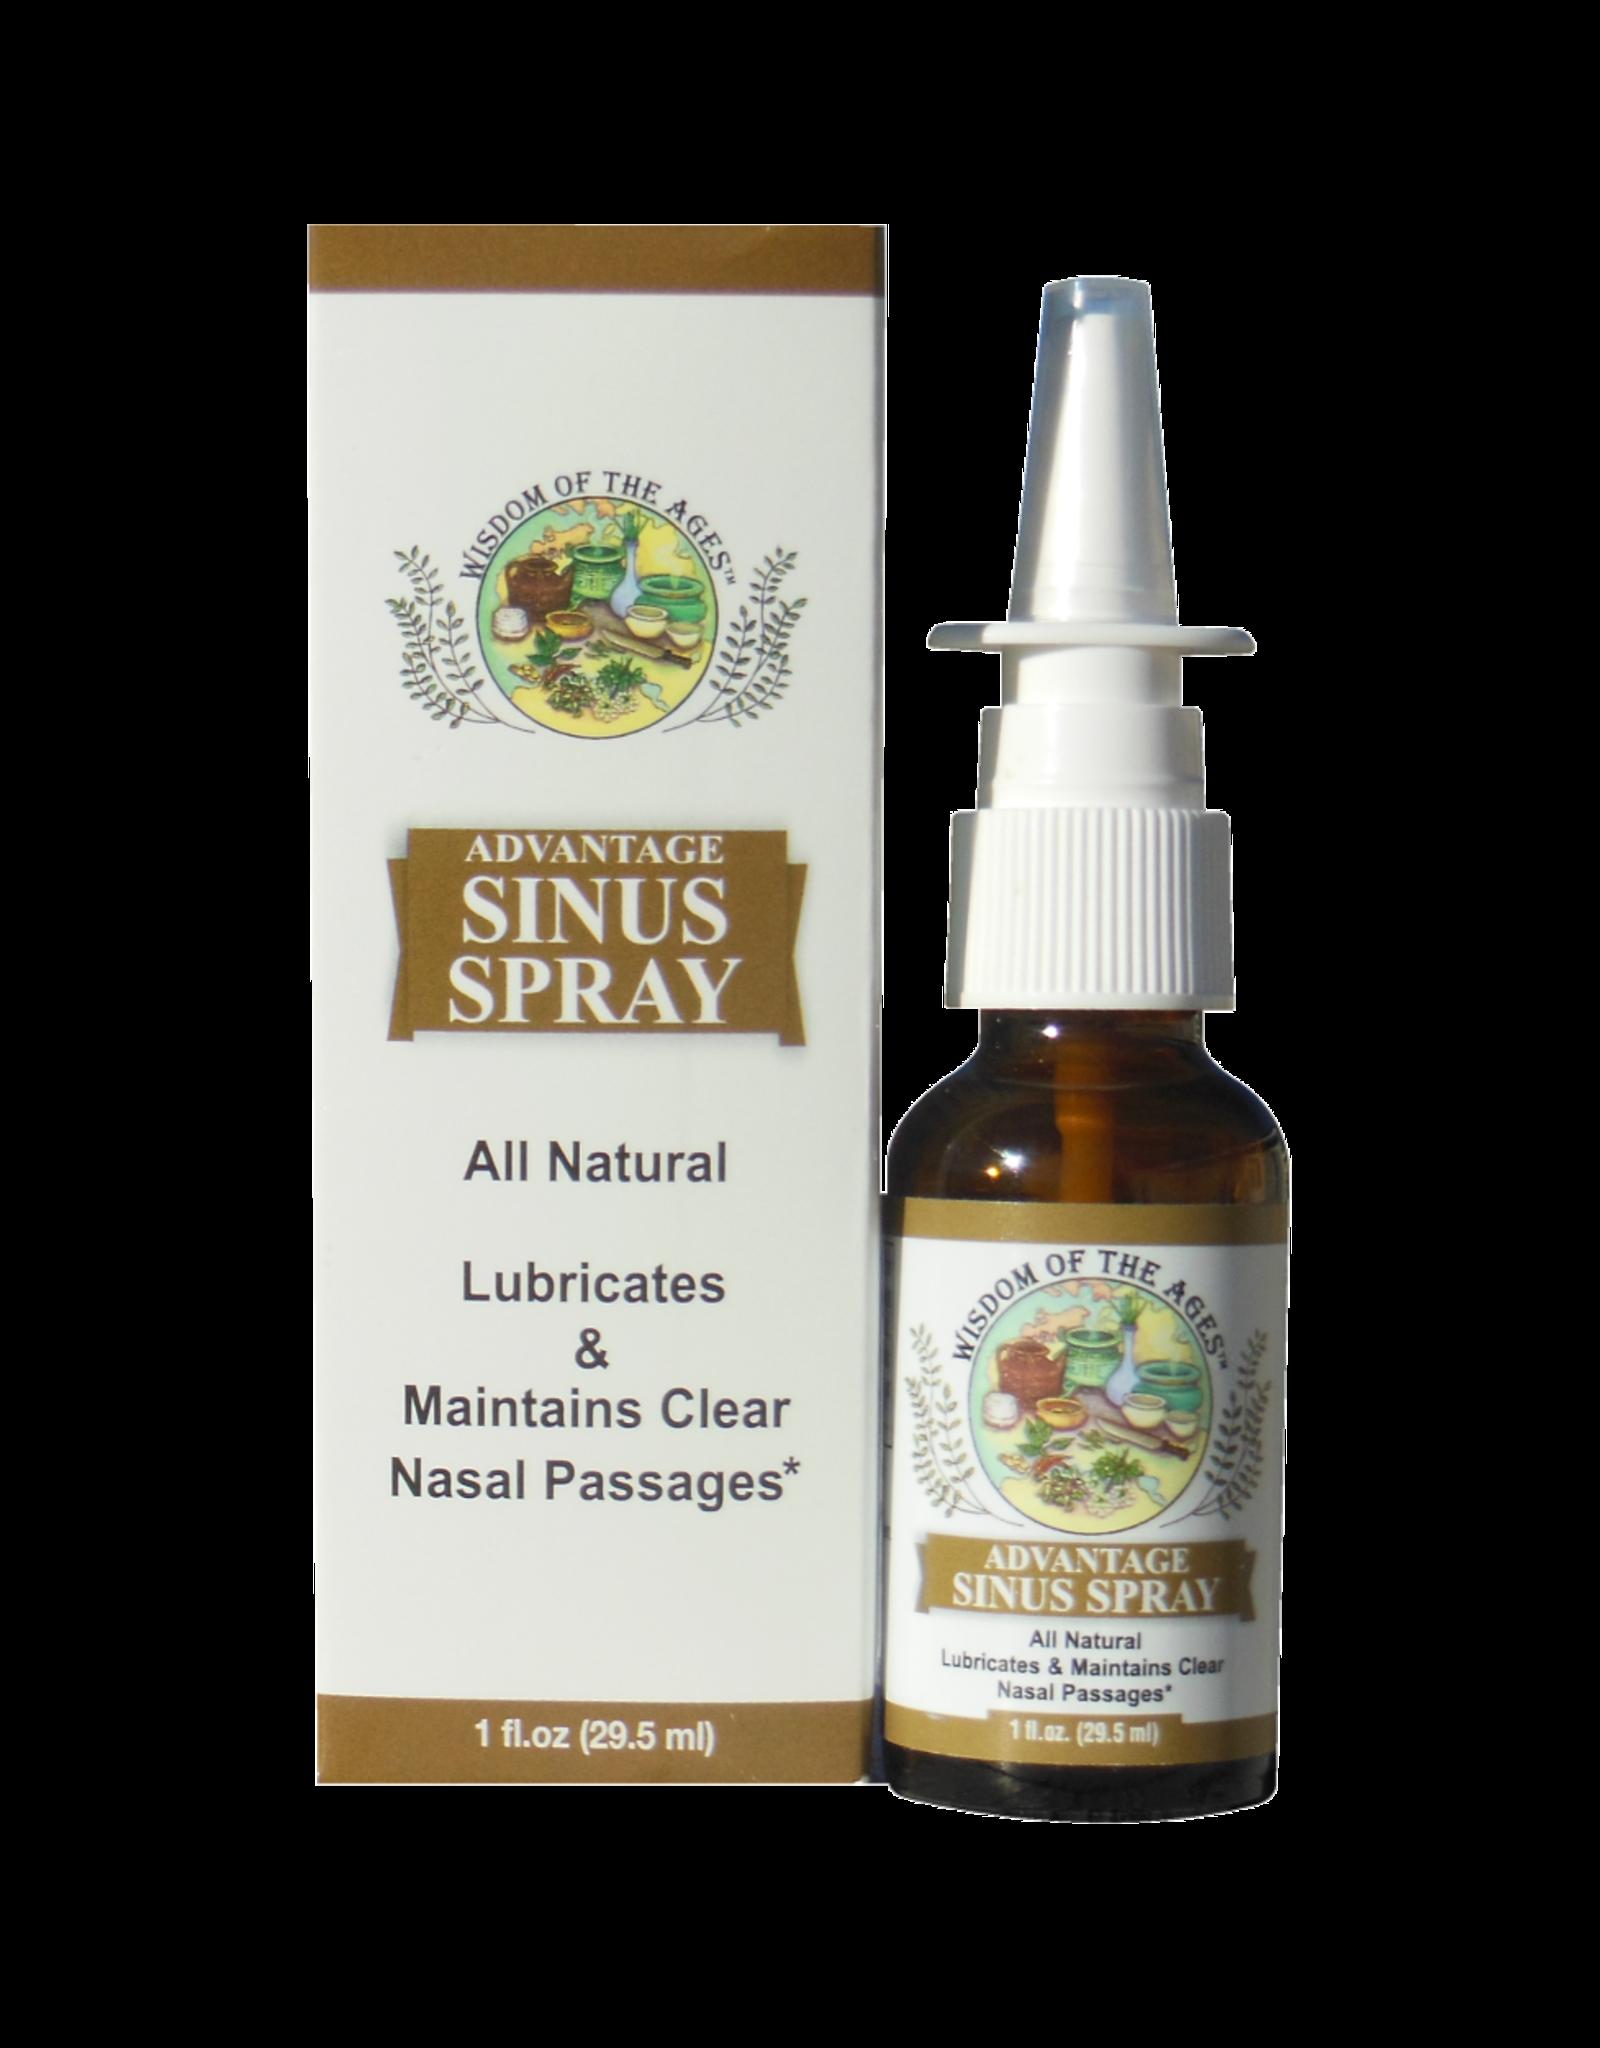 Wisdom of the Ages Advantage Sinus Spray